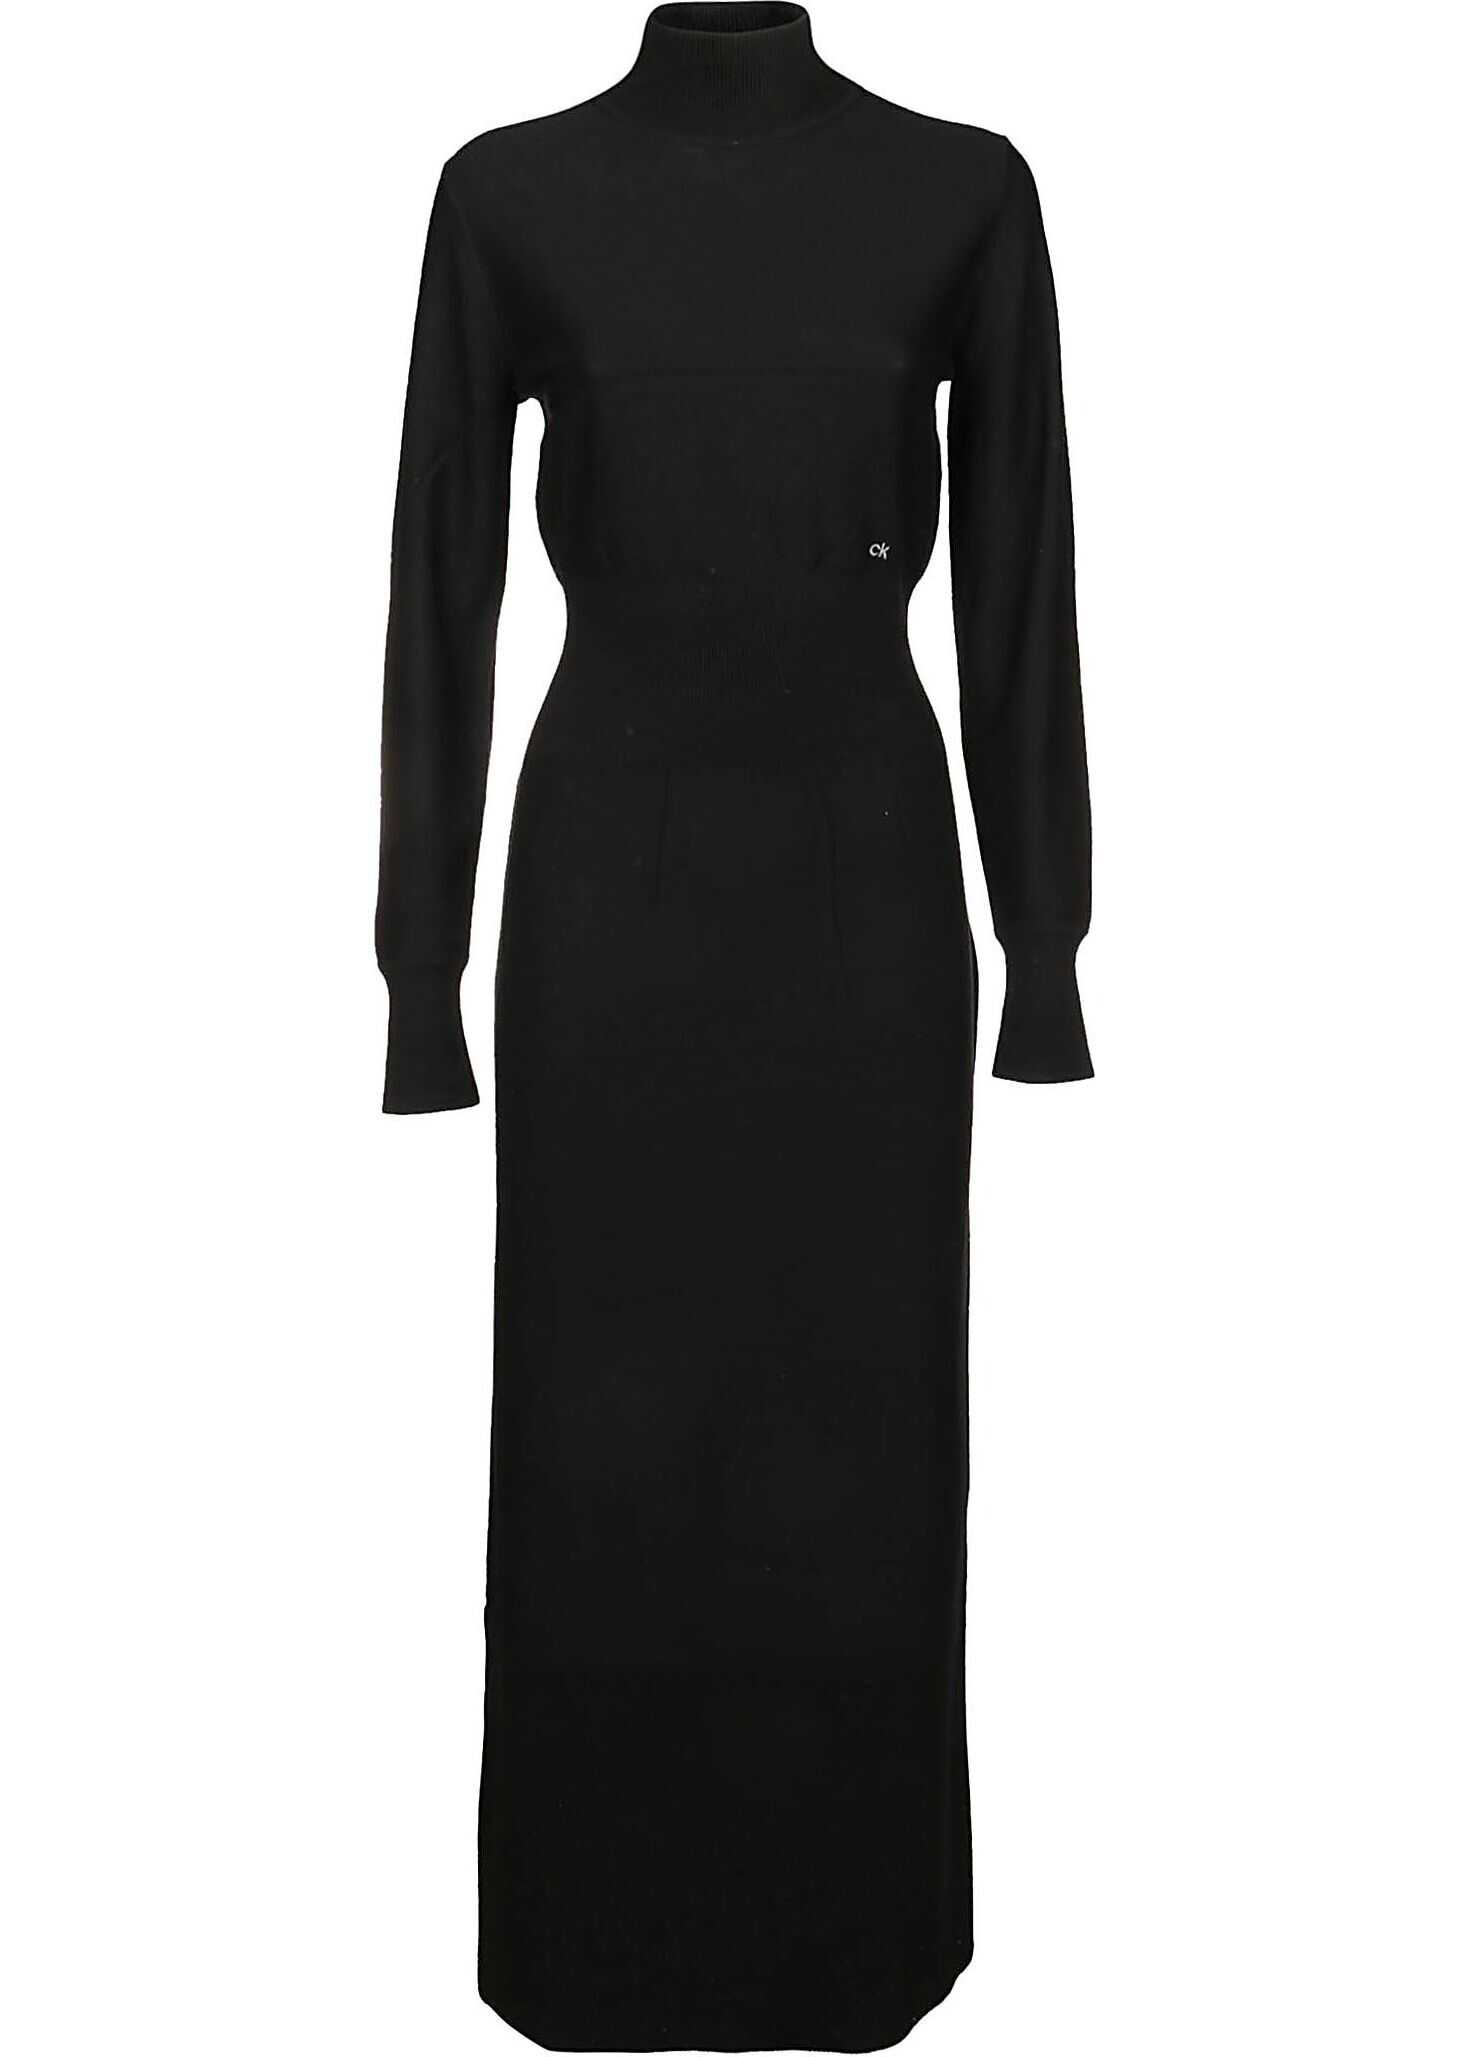 Calvin Klein Wool Dress BLACK